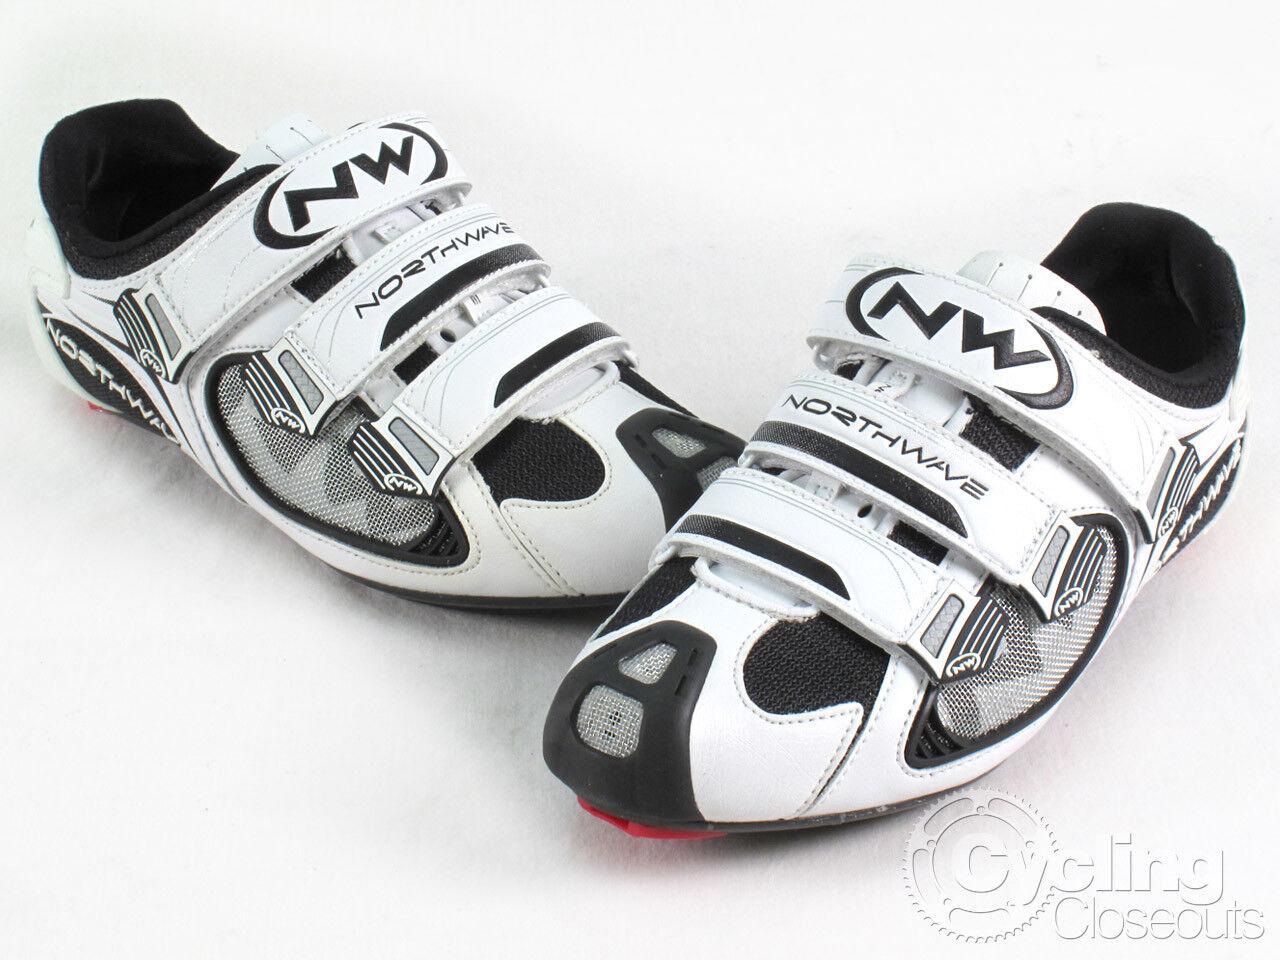 NORTHWAVE AERLITE 3 Zapatos de de de ciclismo de carretera de carbono 8.5 41 d36cc7